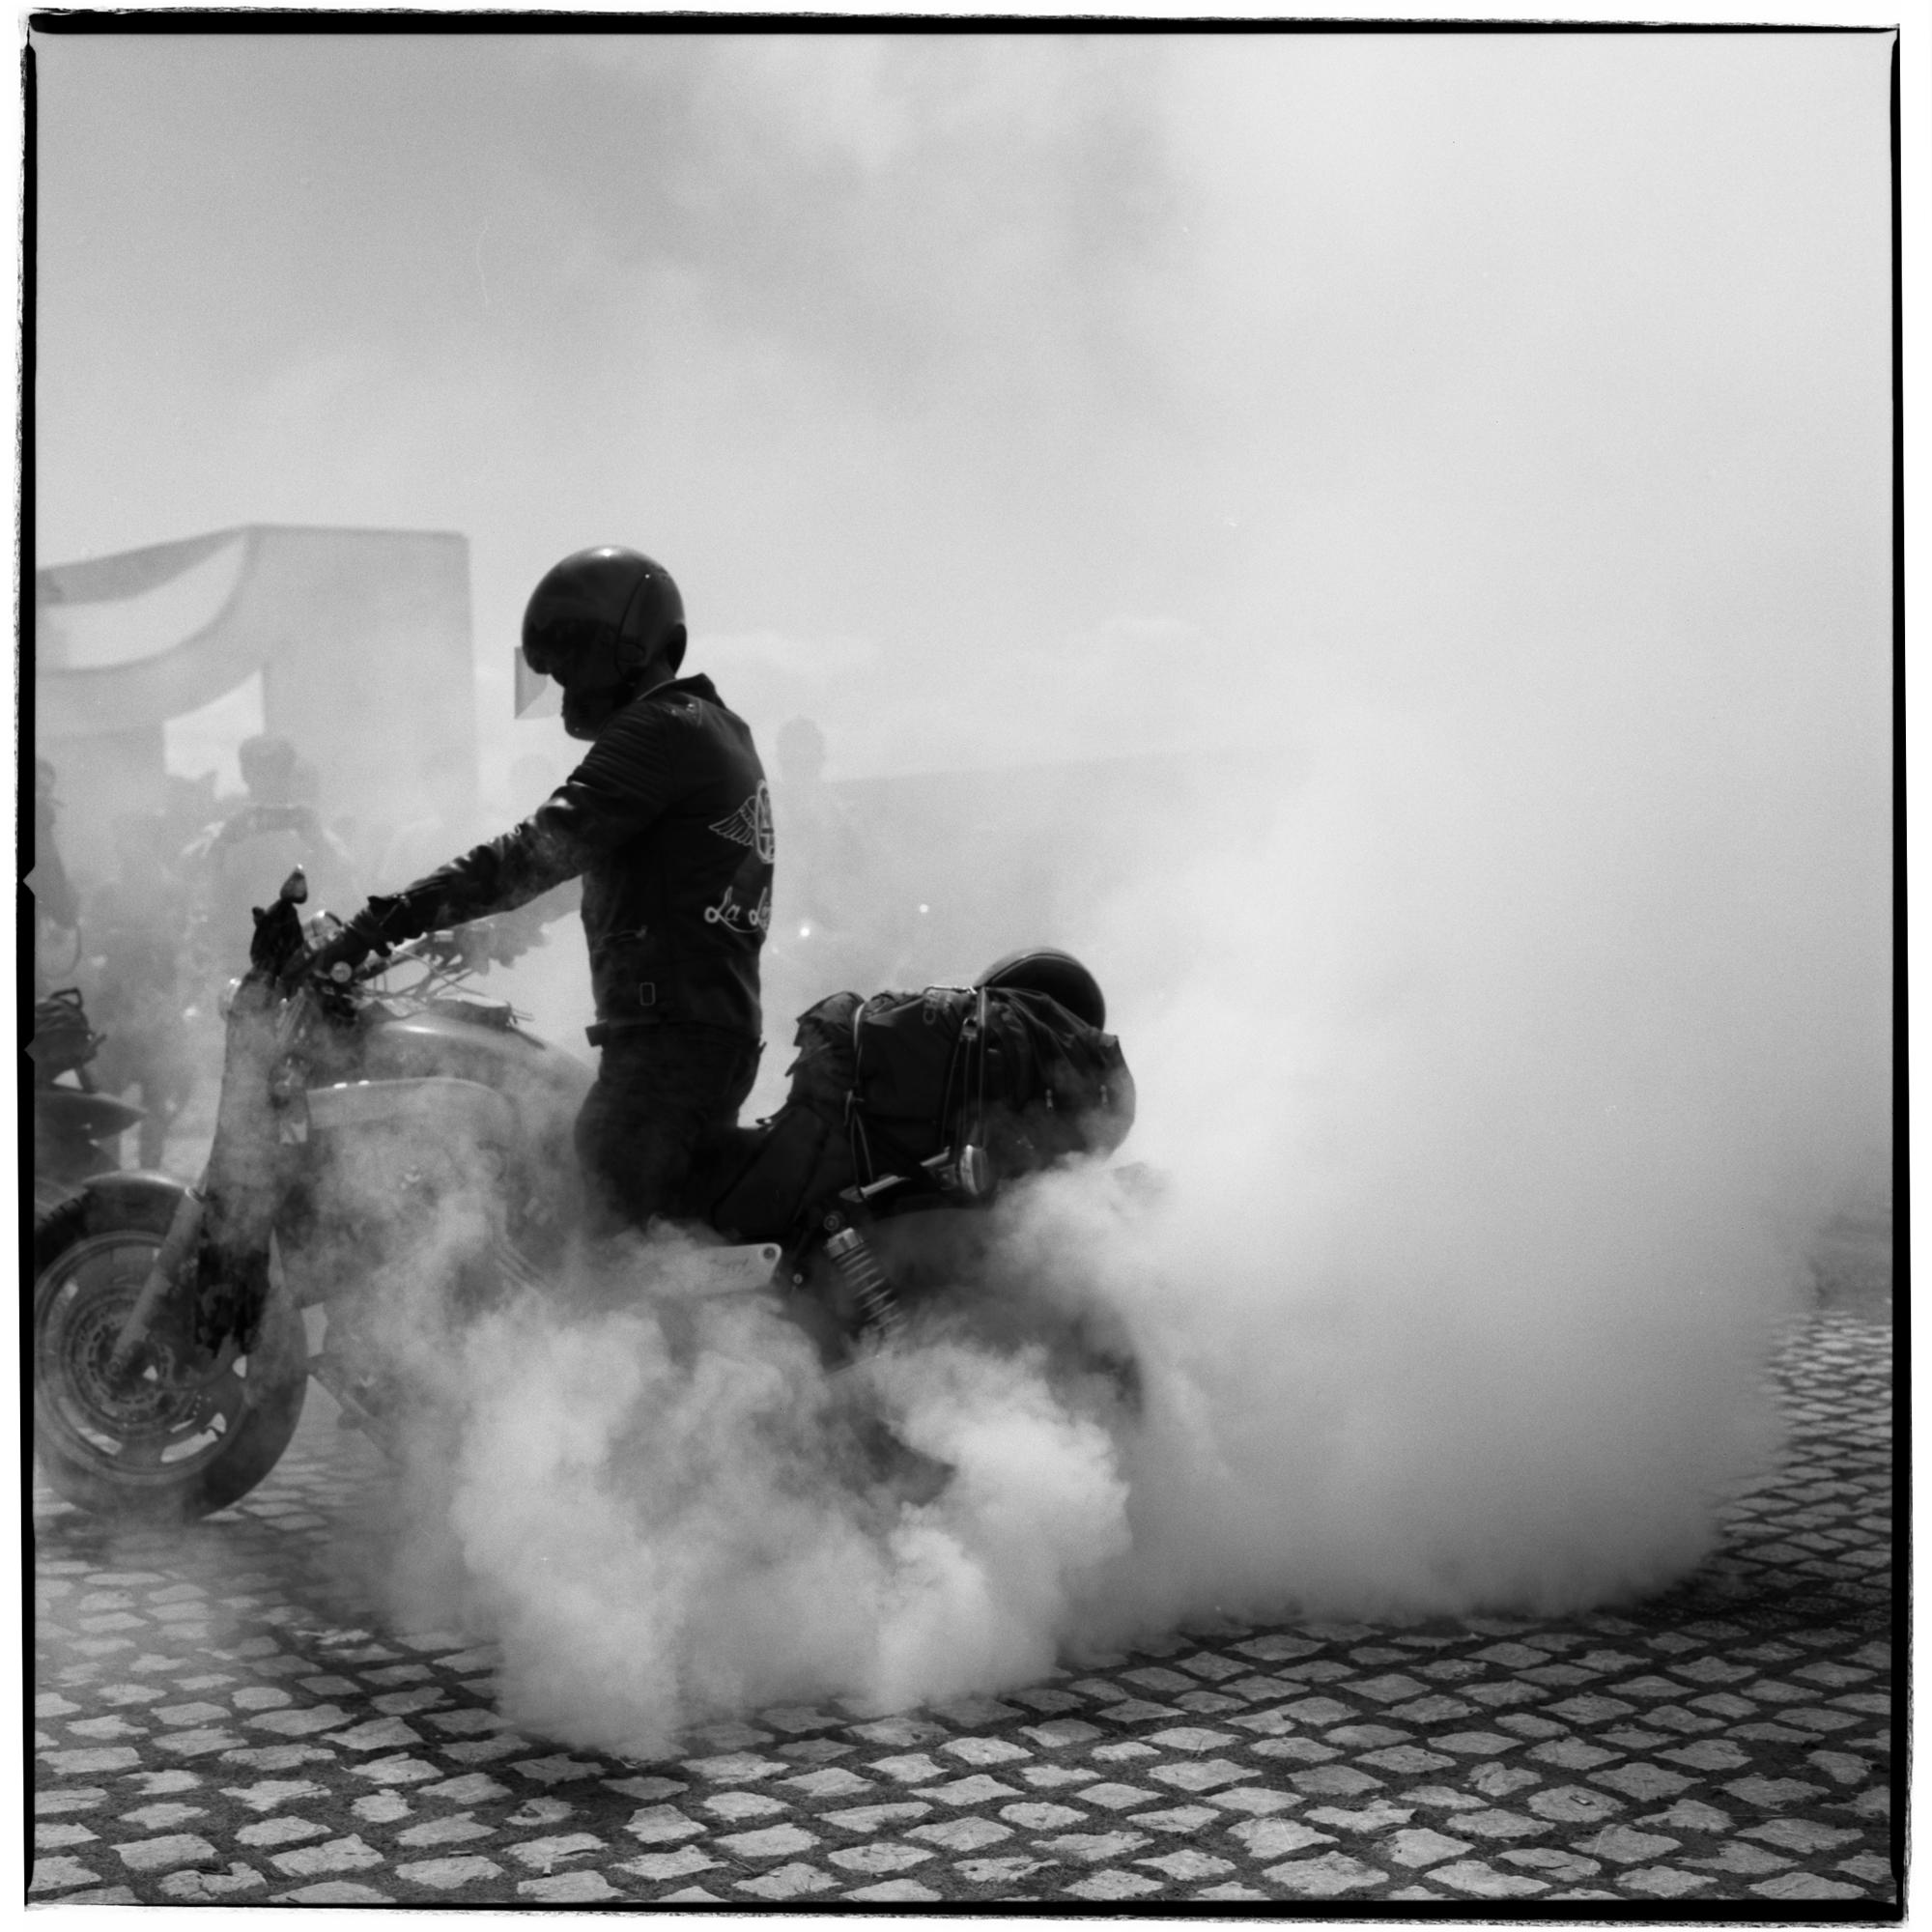 Grant Smith - Biker Revving